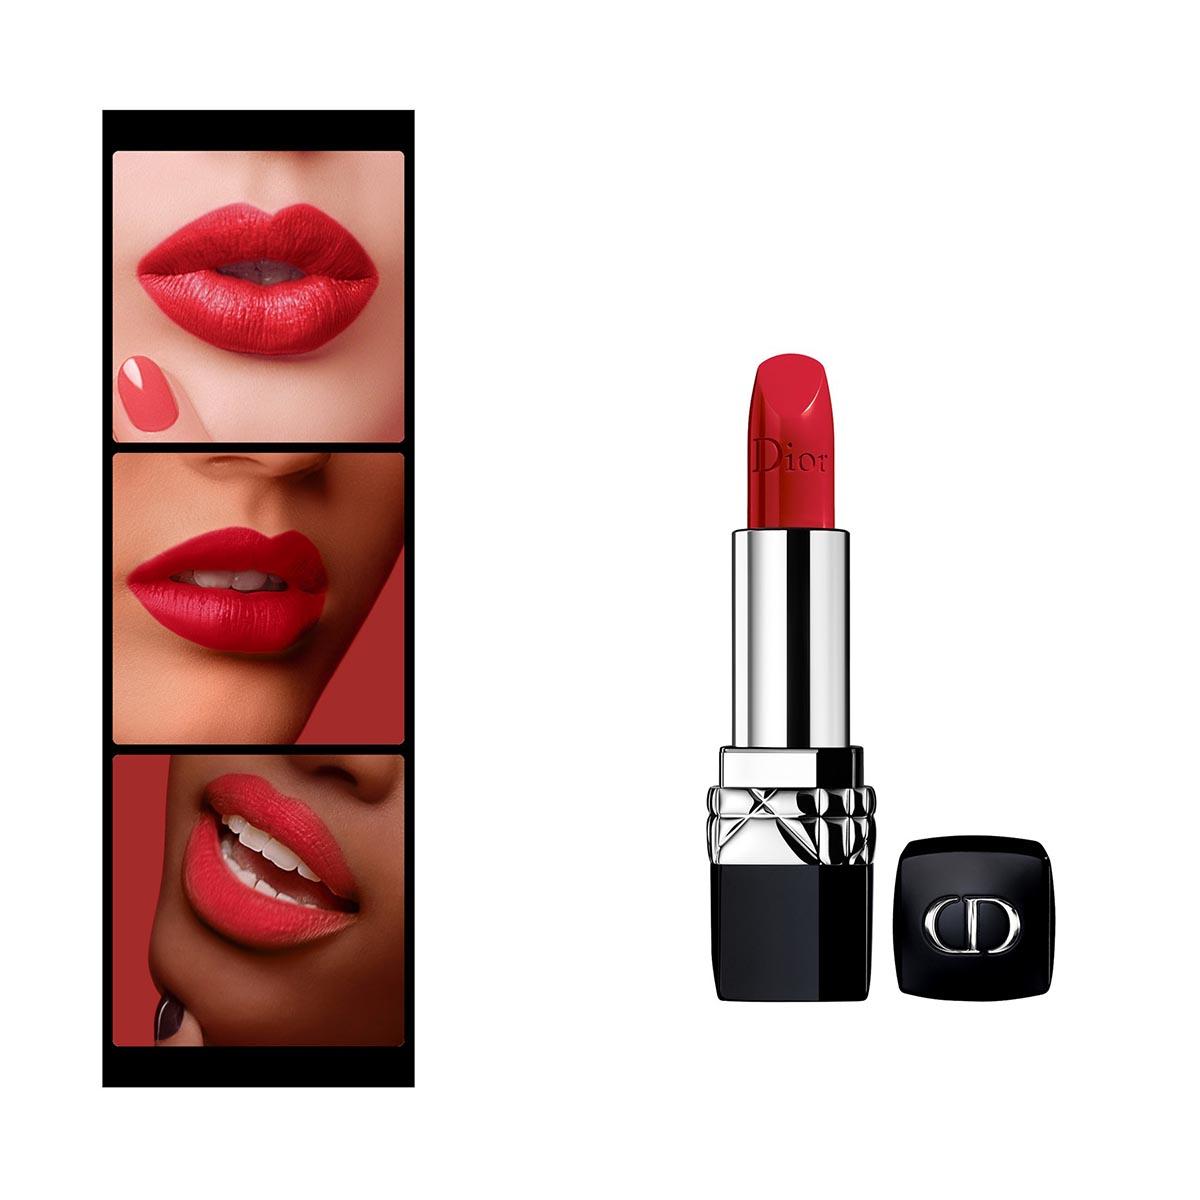 Dior rouge dior 872